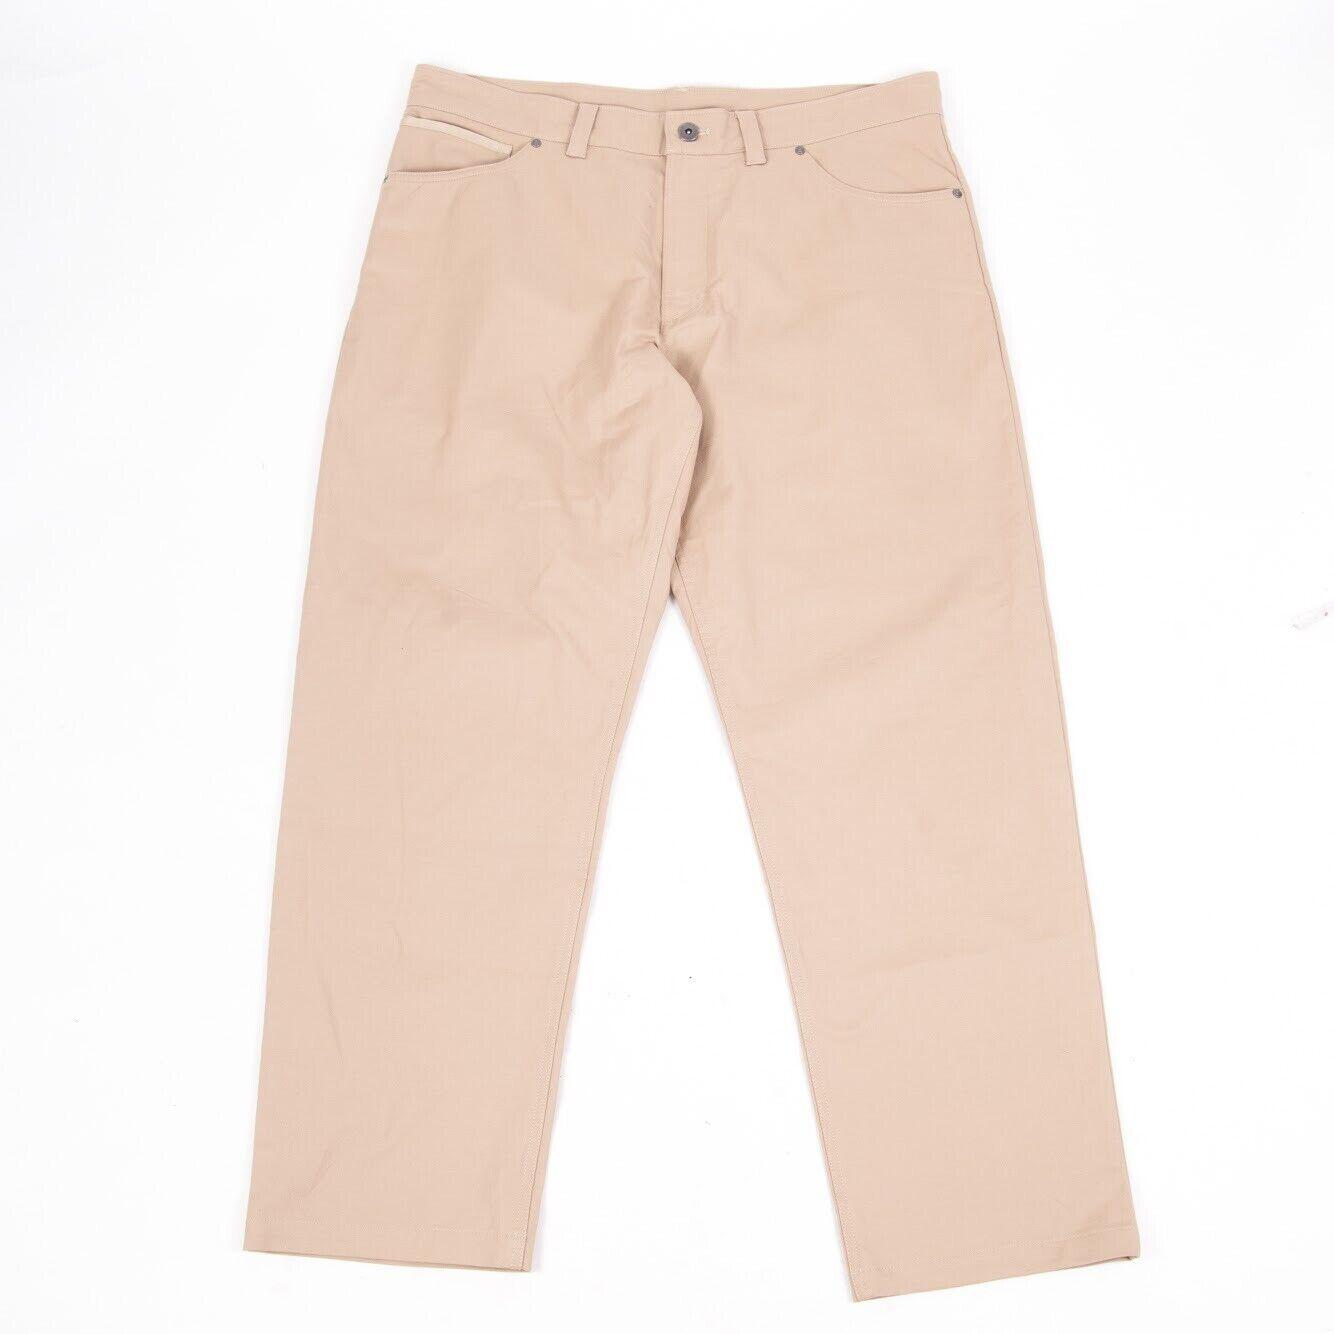 The North Face Mens Dress Casual Pants Khaki Flat Front Cotton elastane 38 R